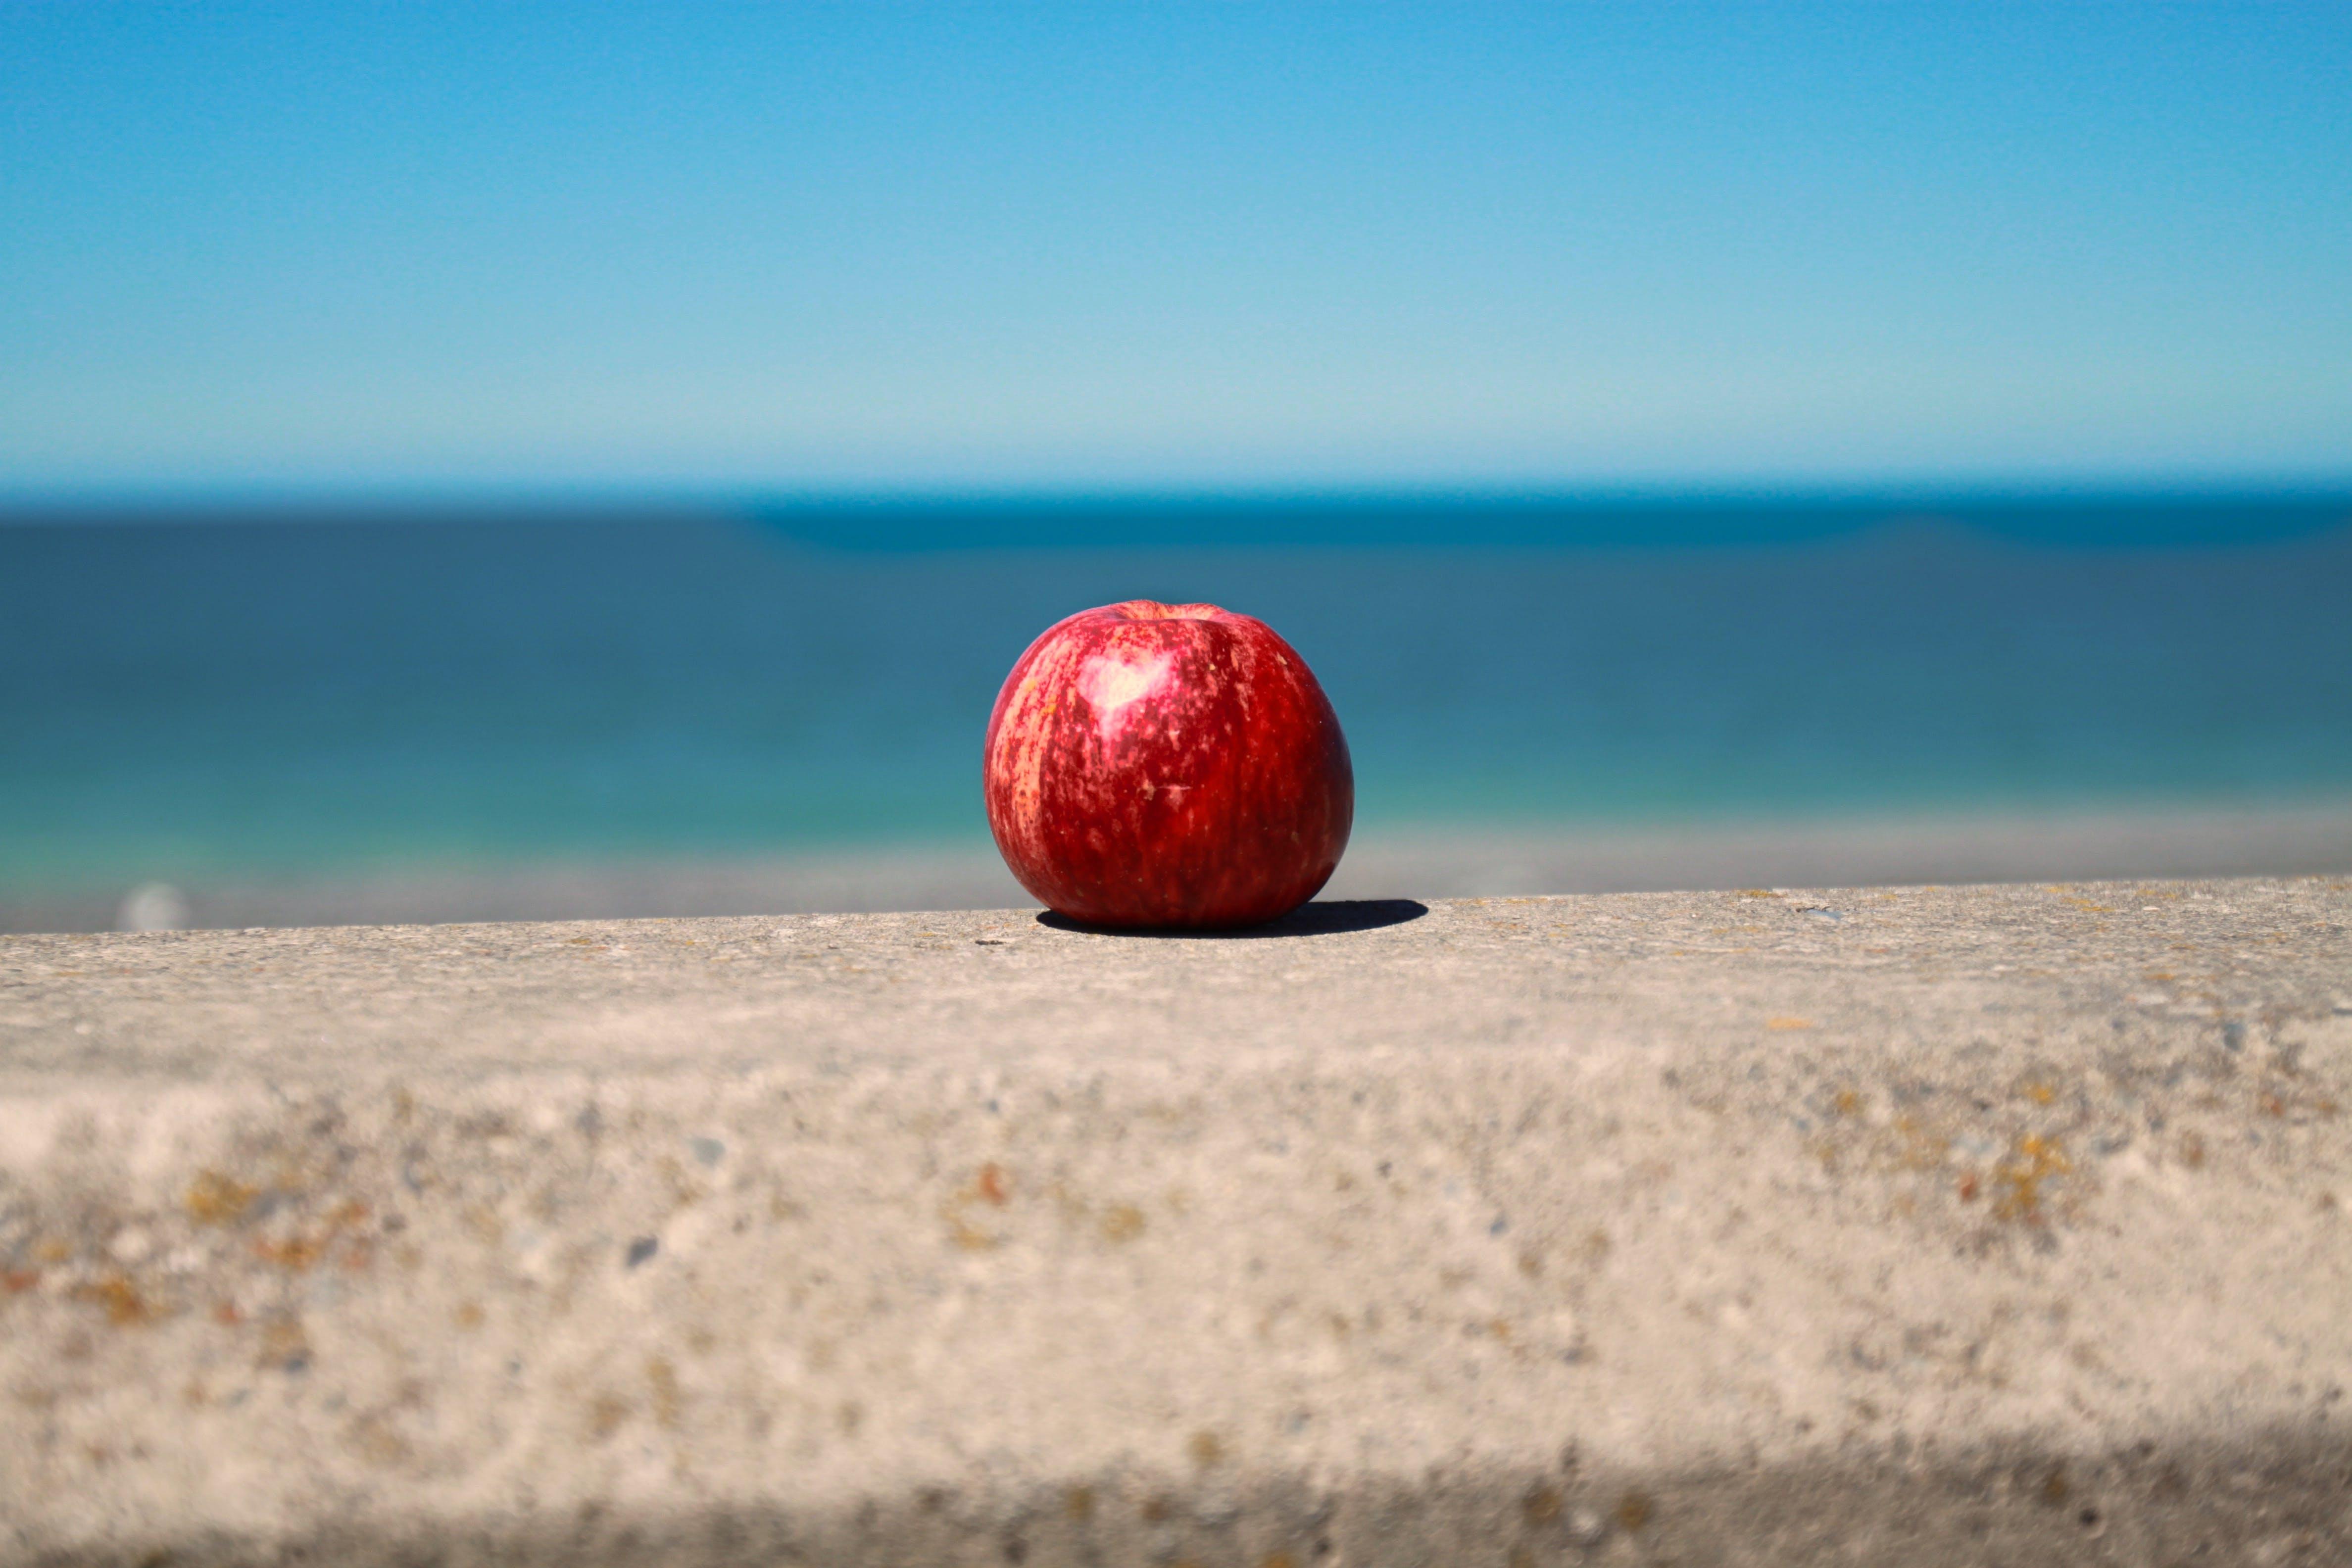 Free stock photo of sea, sky, beach, red